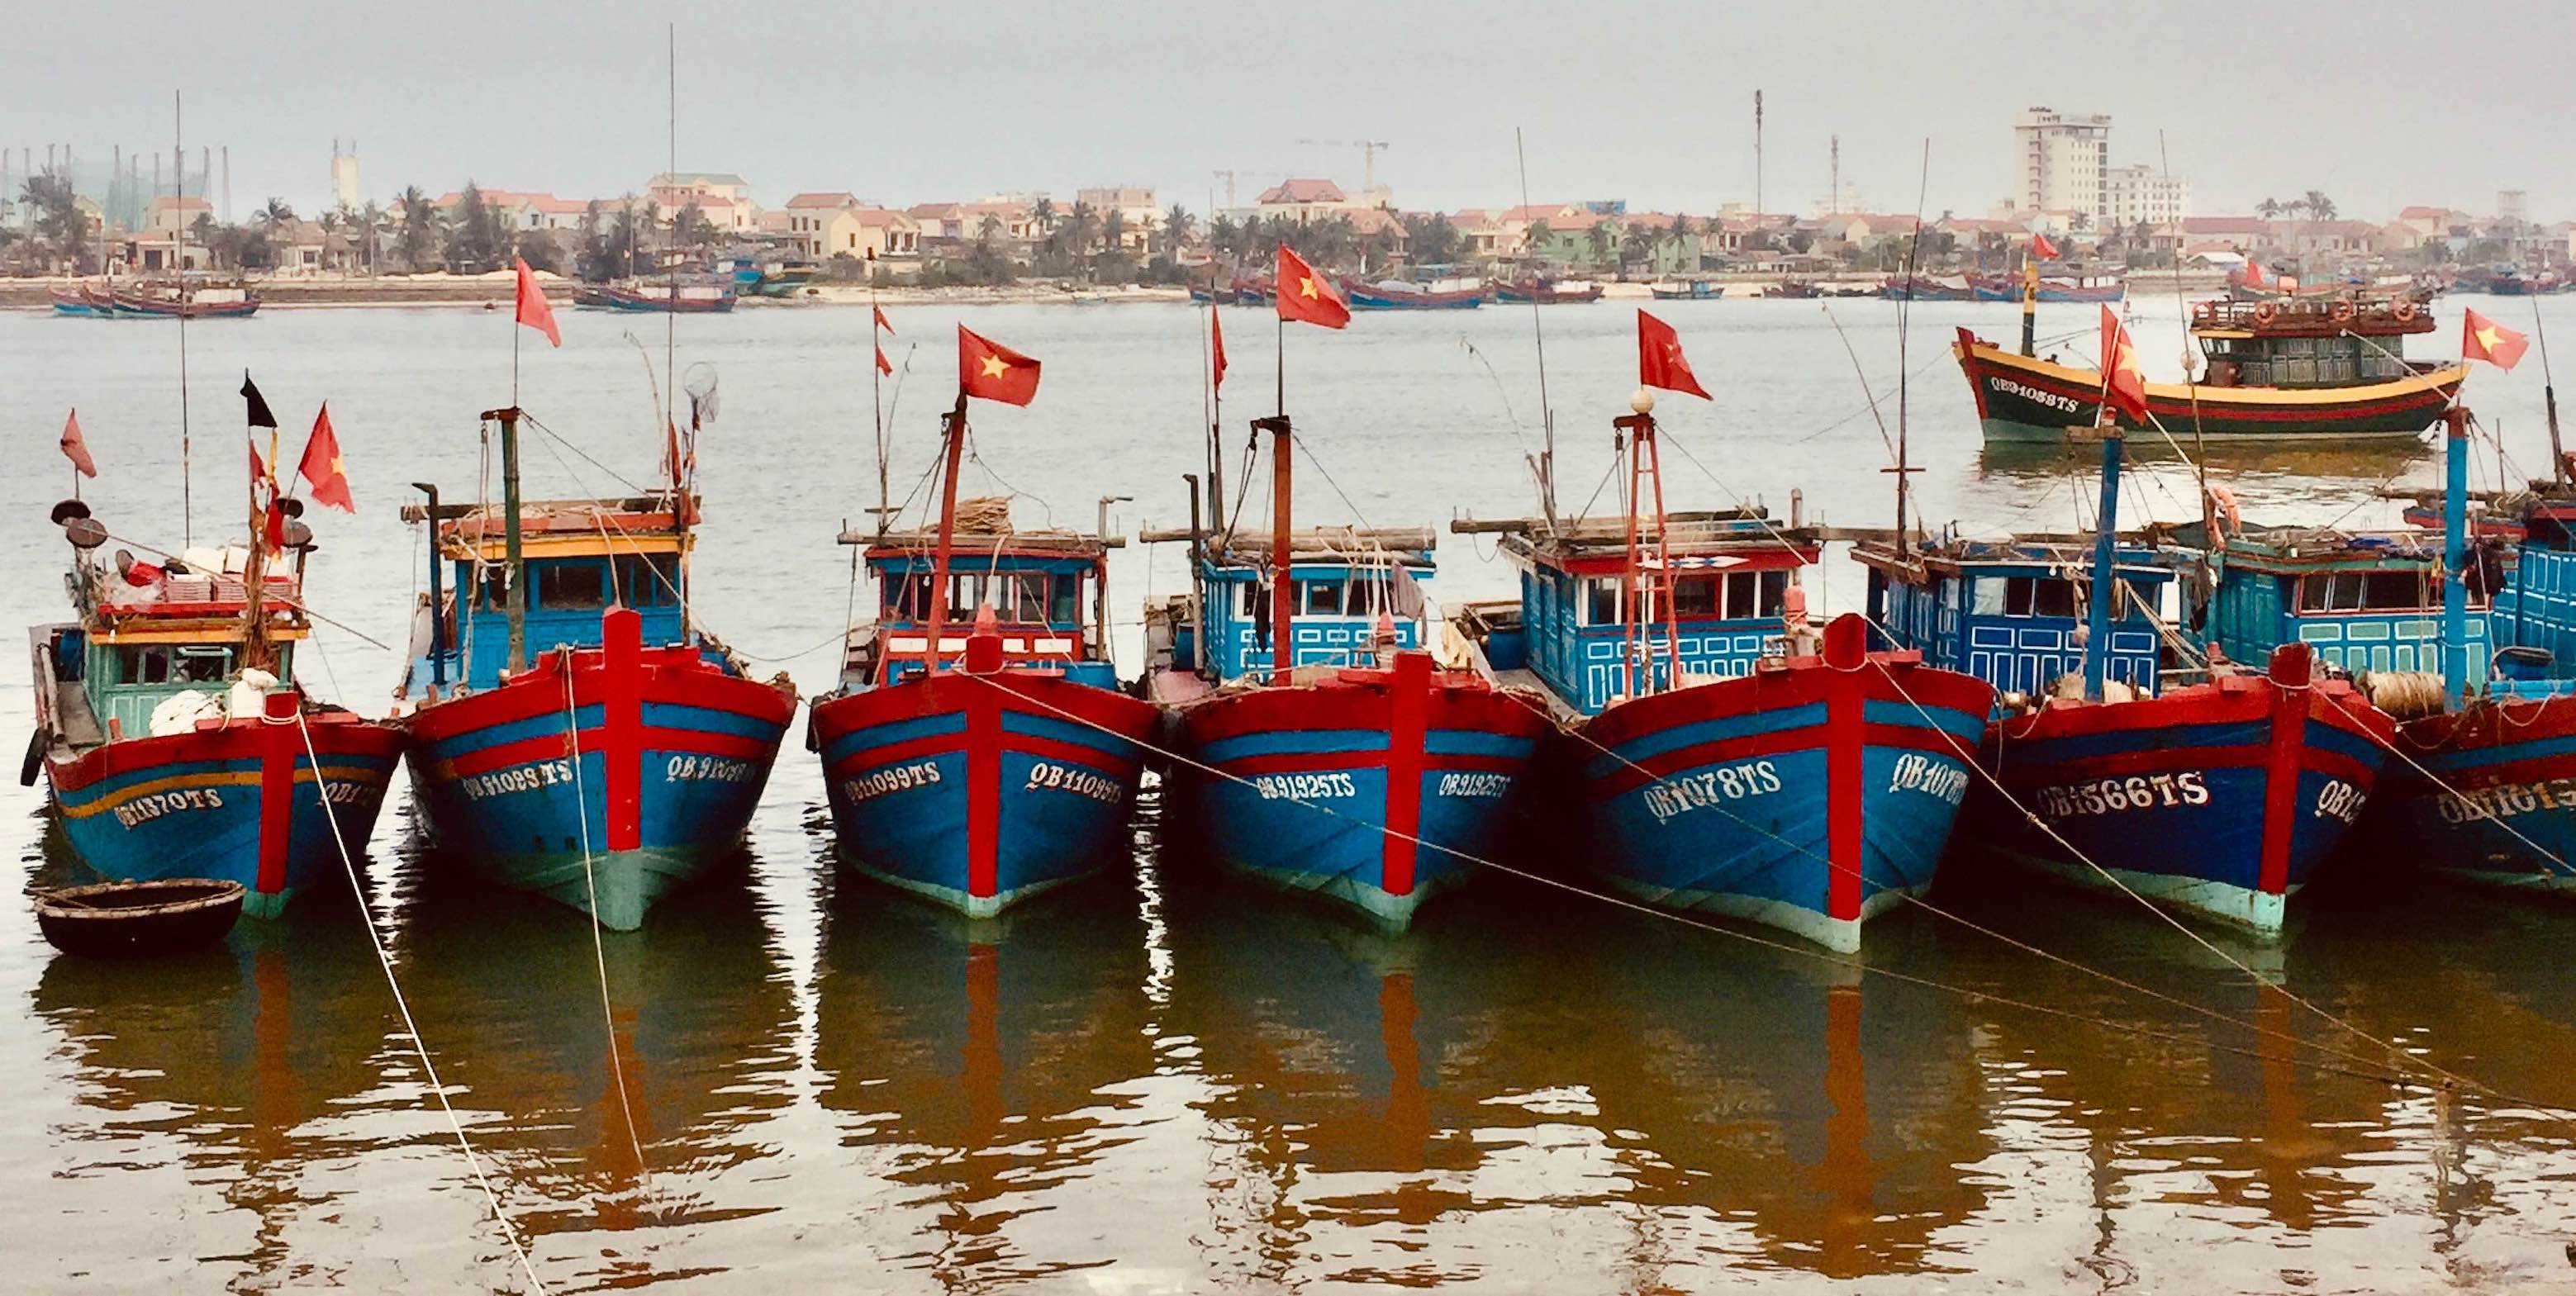 Fishing boats Dong Hoi Vietnam.